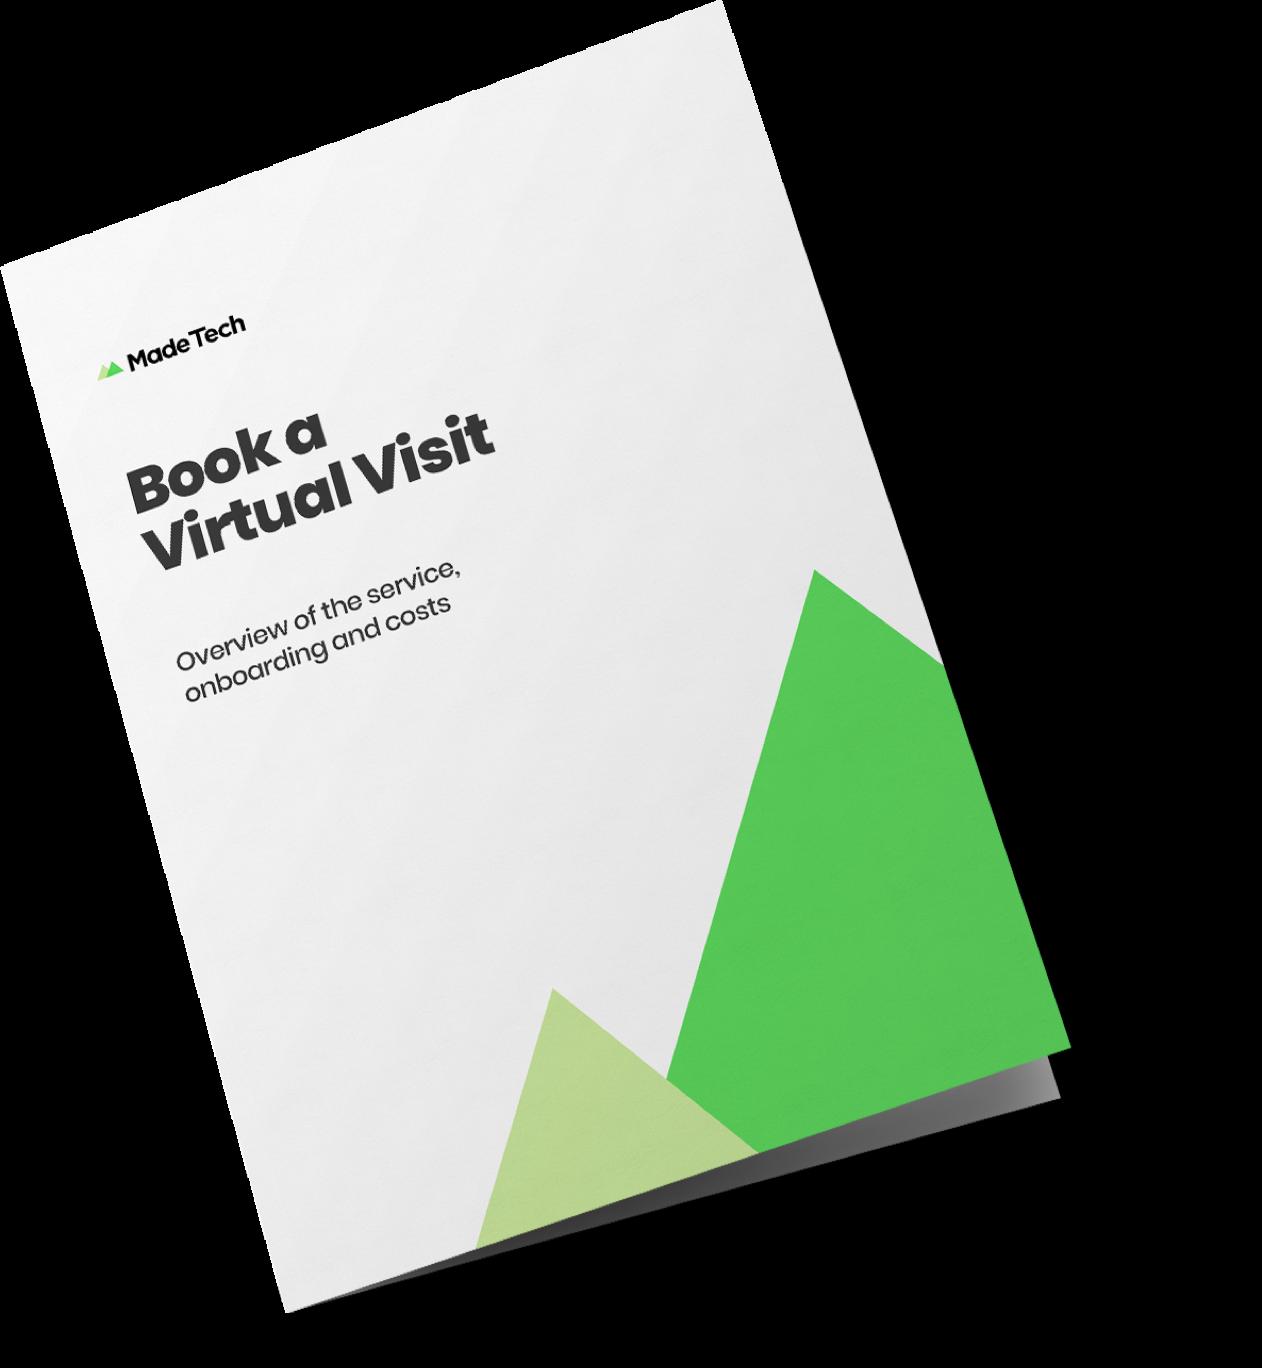 Book a virtual visit cover